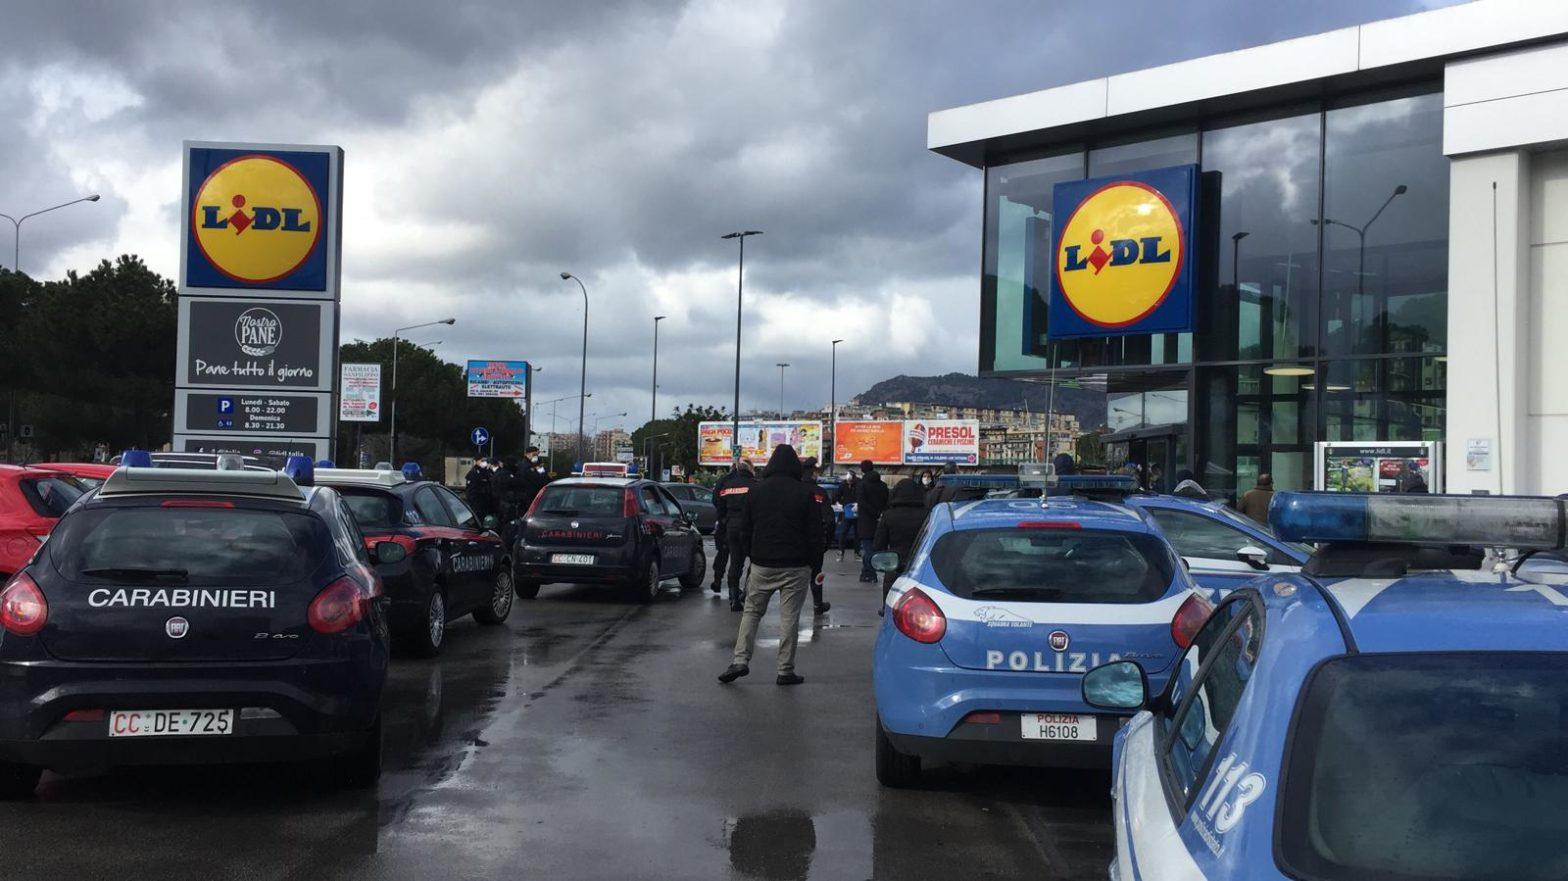 spesa lidl polizia palermo